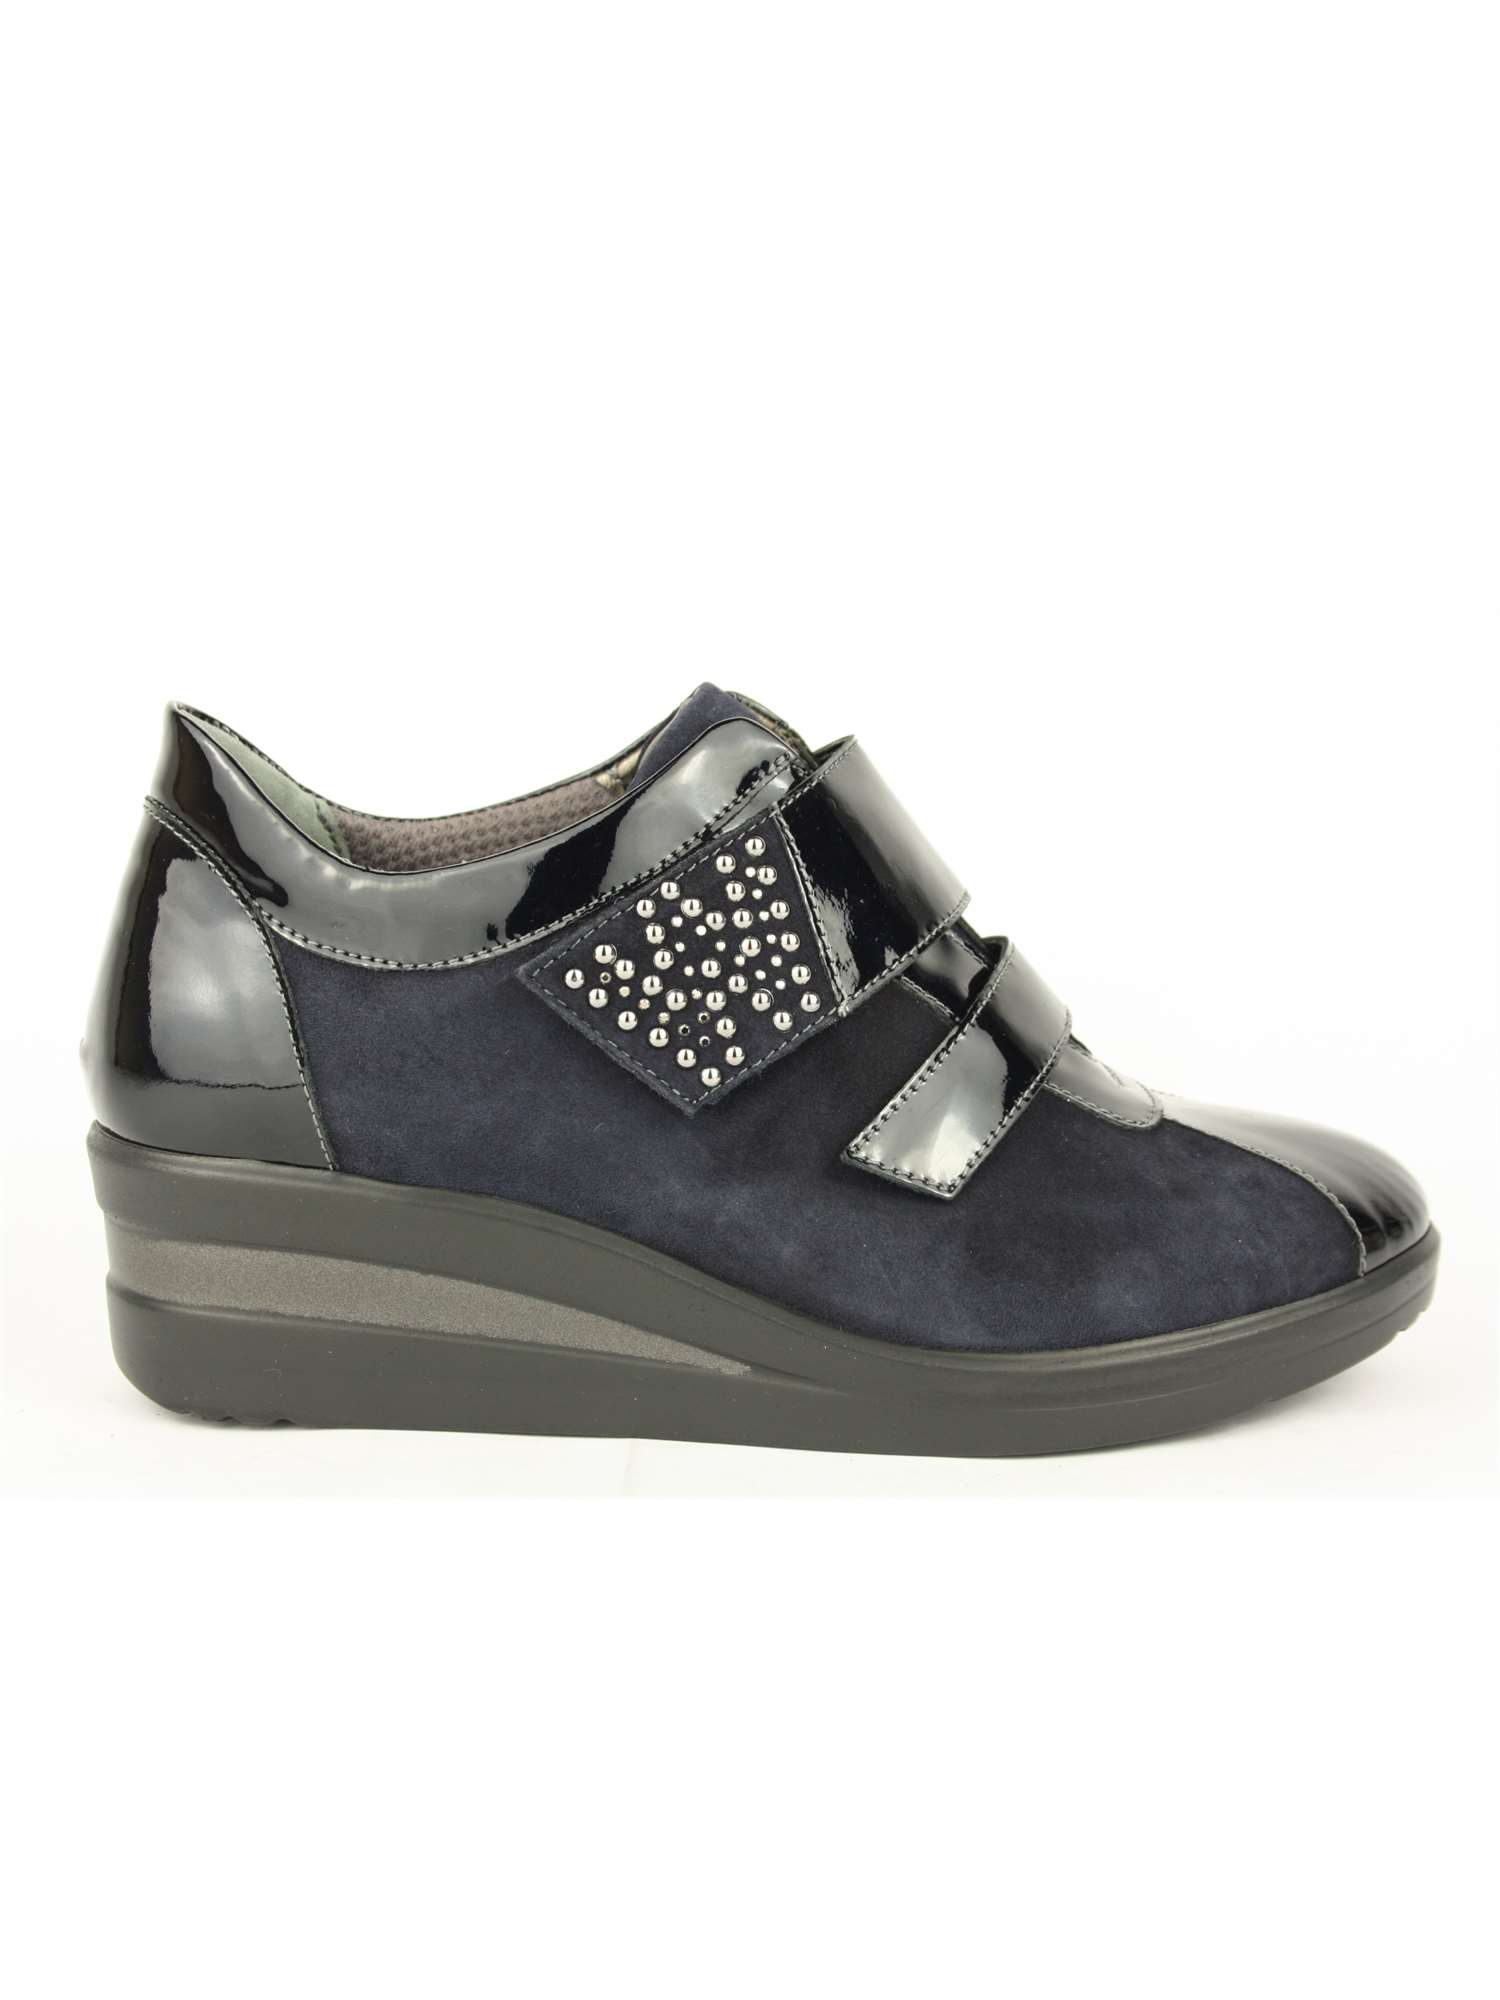 the latest b3afa db413 Melluso Velcro Blu   Velcro Donna Vernice   Tania Calzature Bari